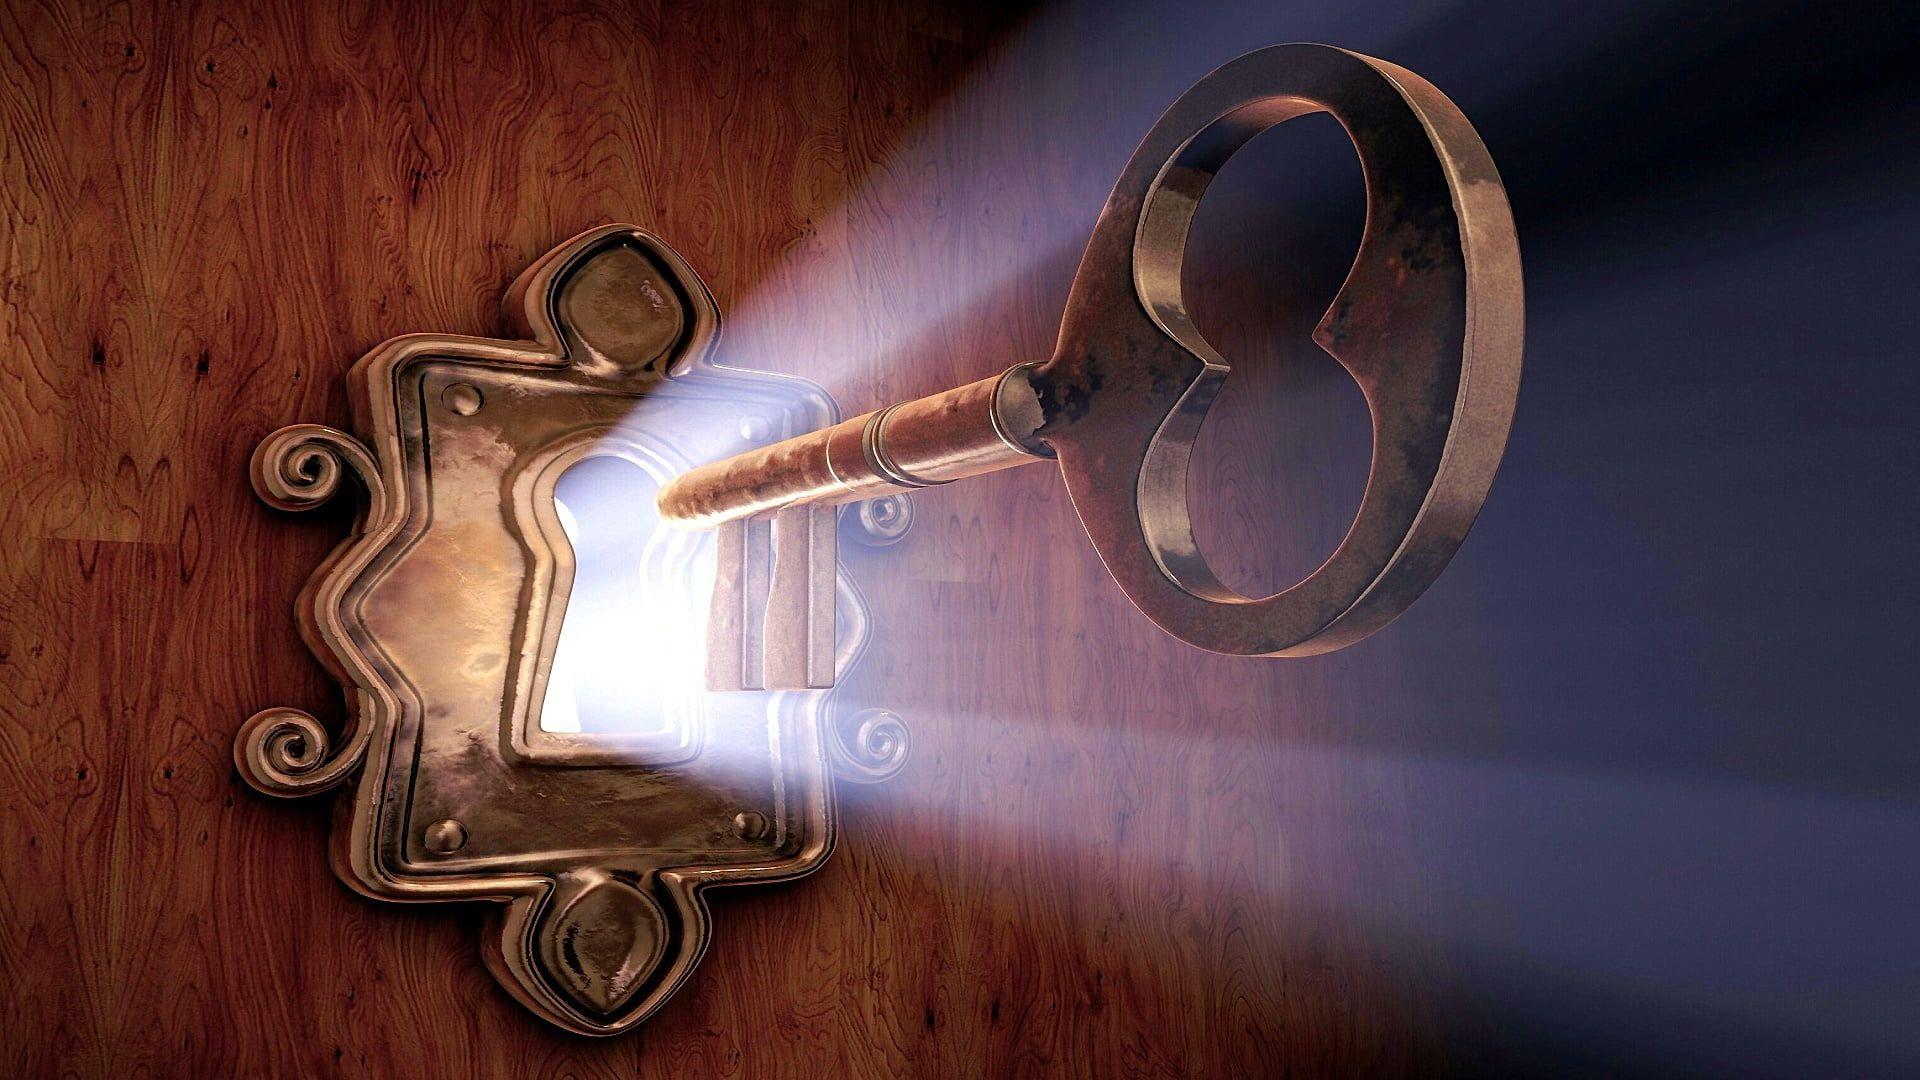 Photo of #light #key #metal #door #lock #illustration